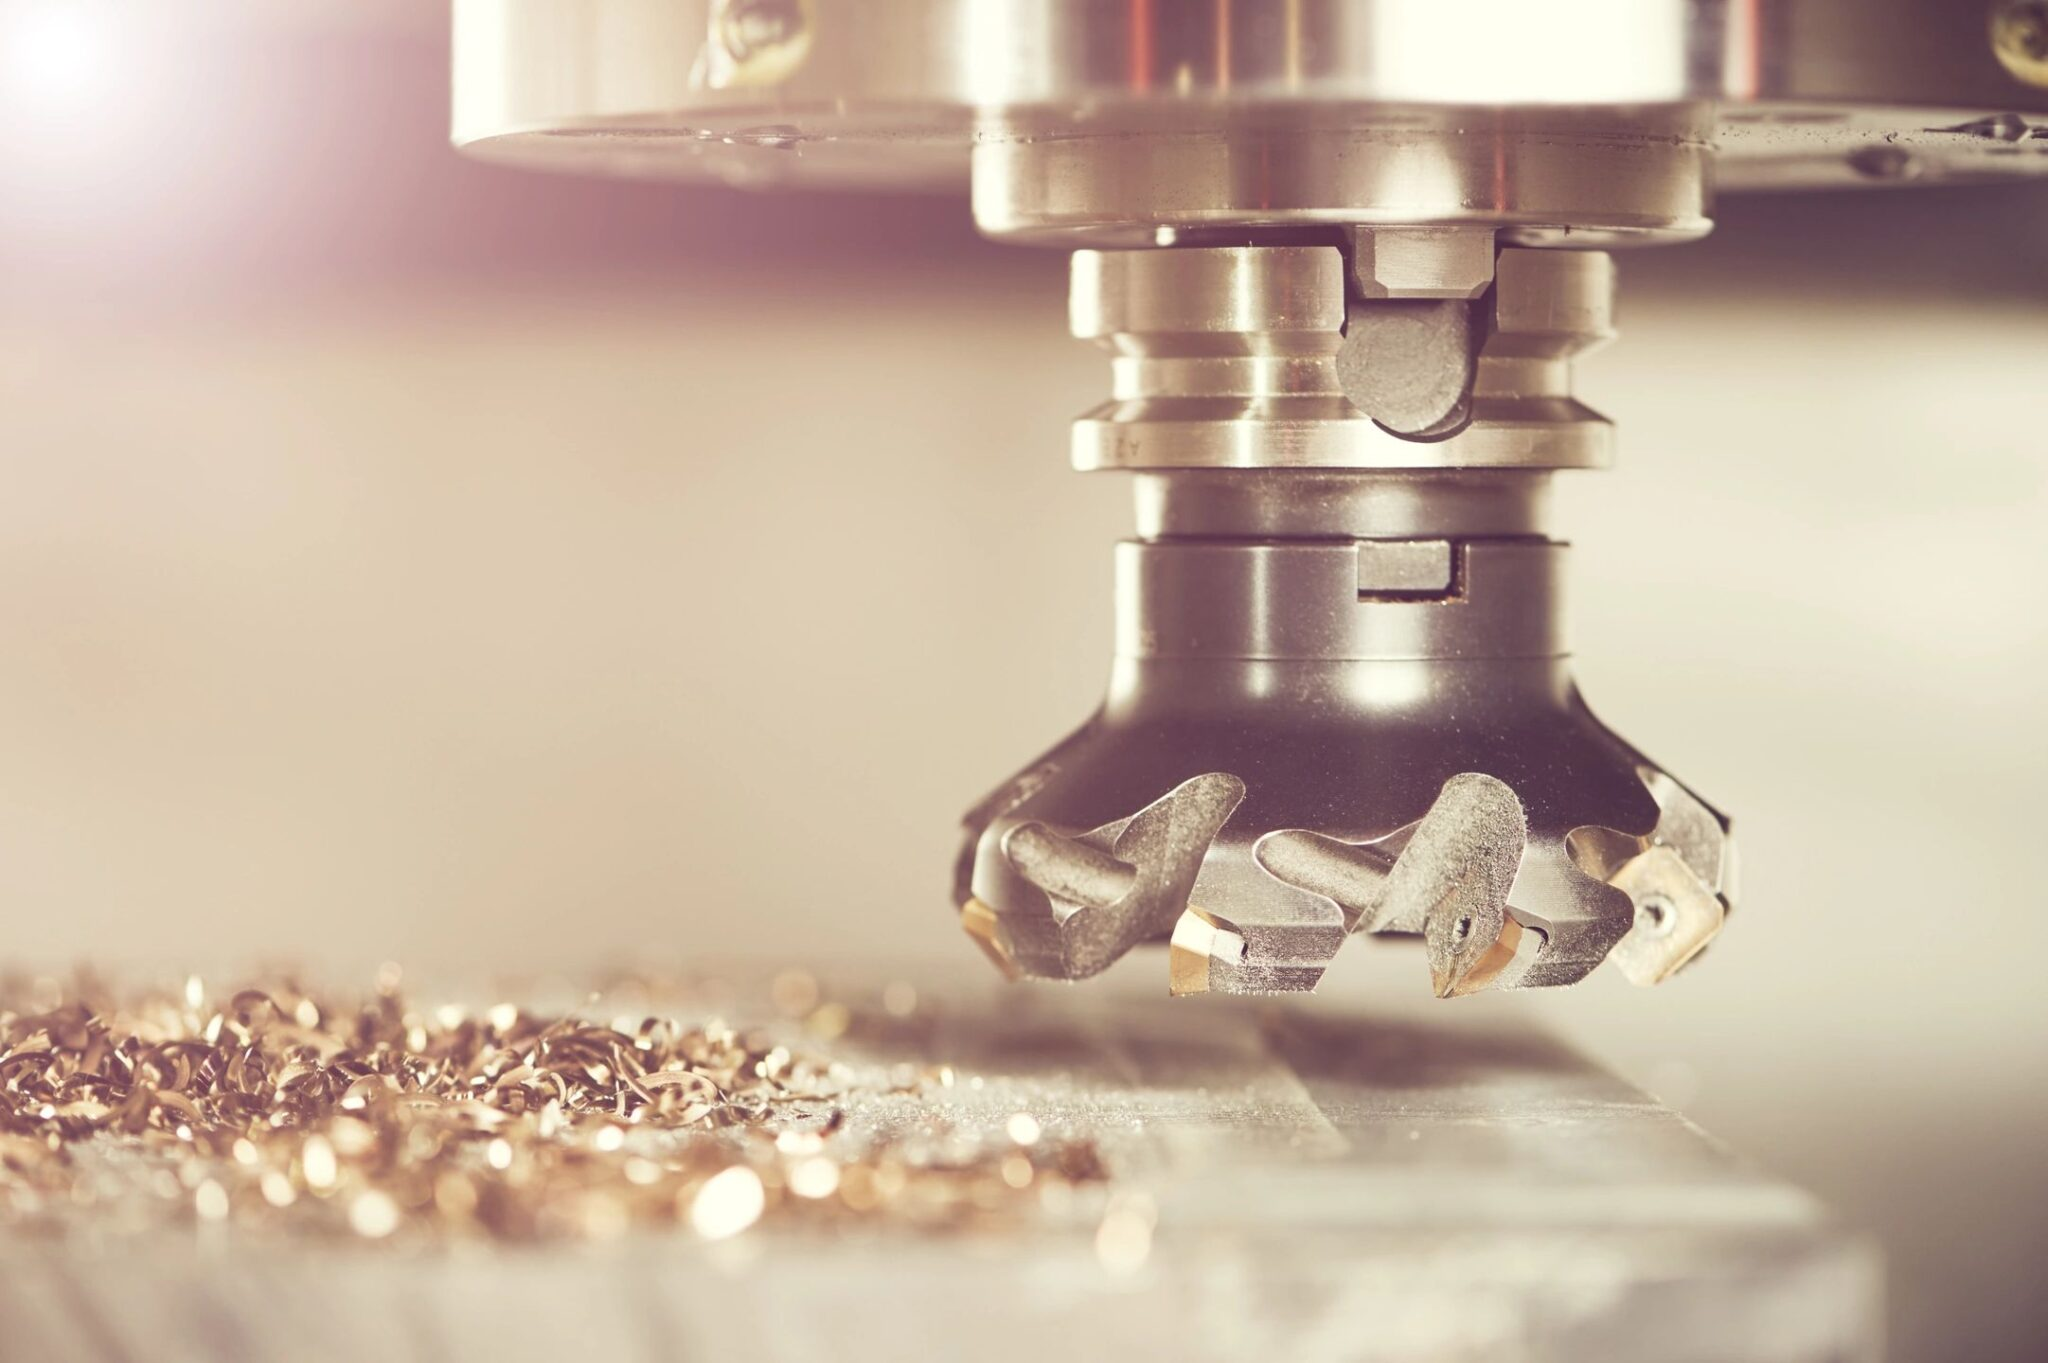 Machining Equipment Financing